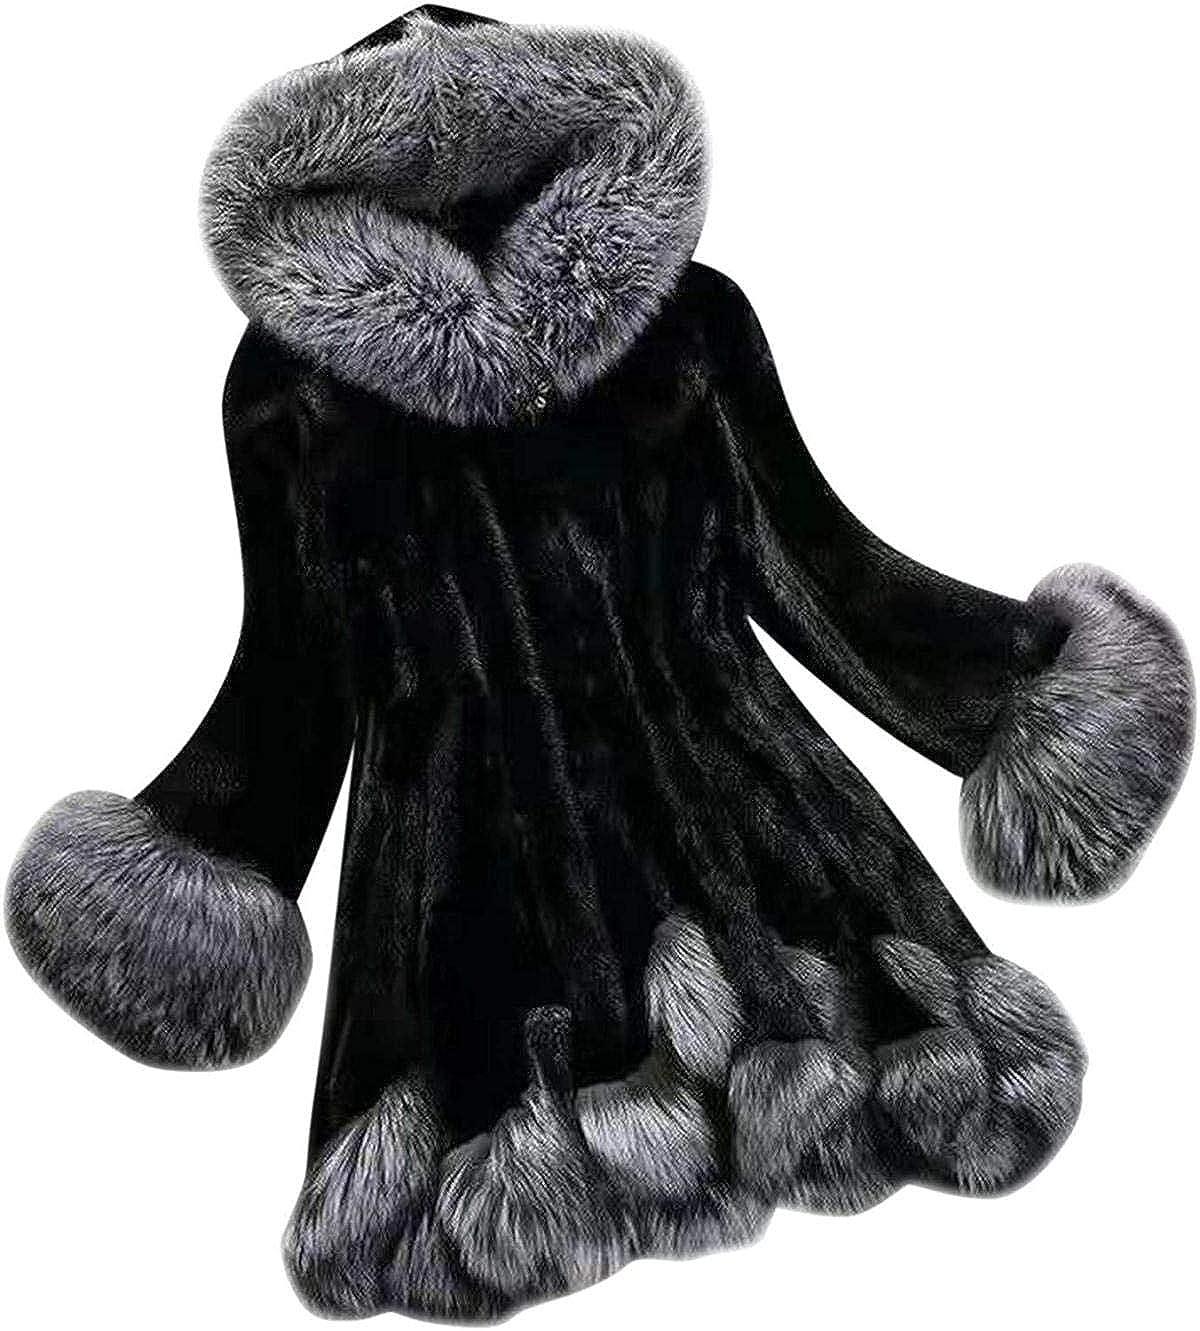 Womens Faux Fur Coats with Hood Winter Fashion Elegant Thicken Warm Plush Cardigan Cloak Outwear Overcoat Jackets